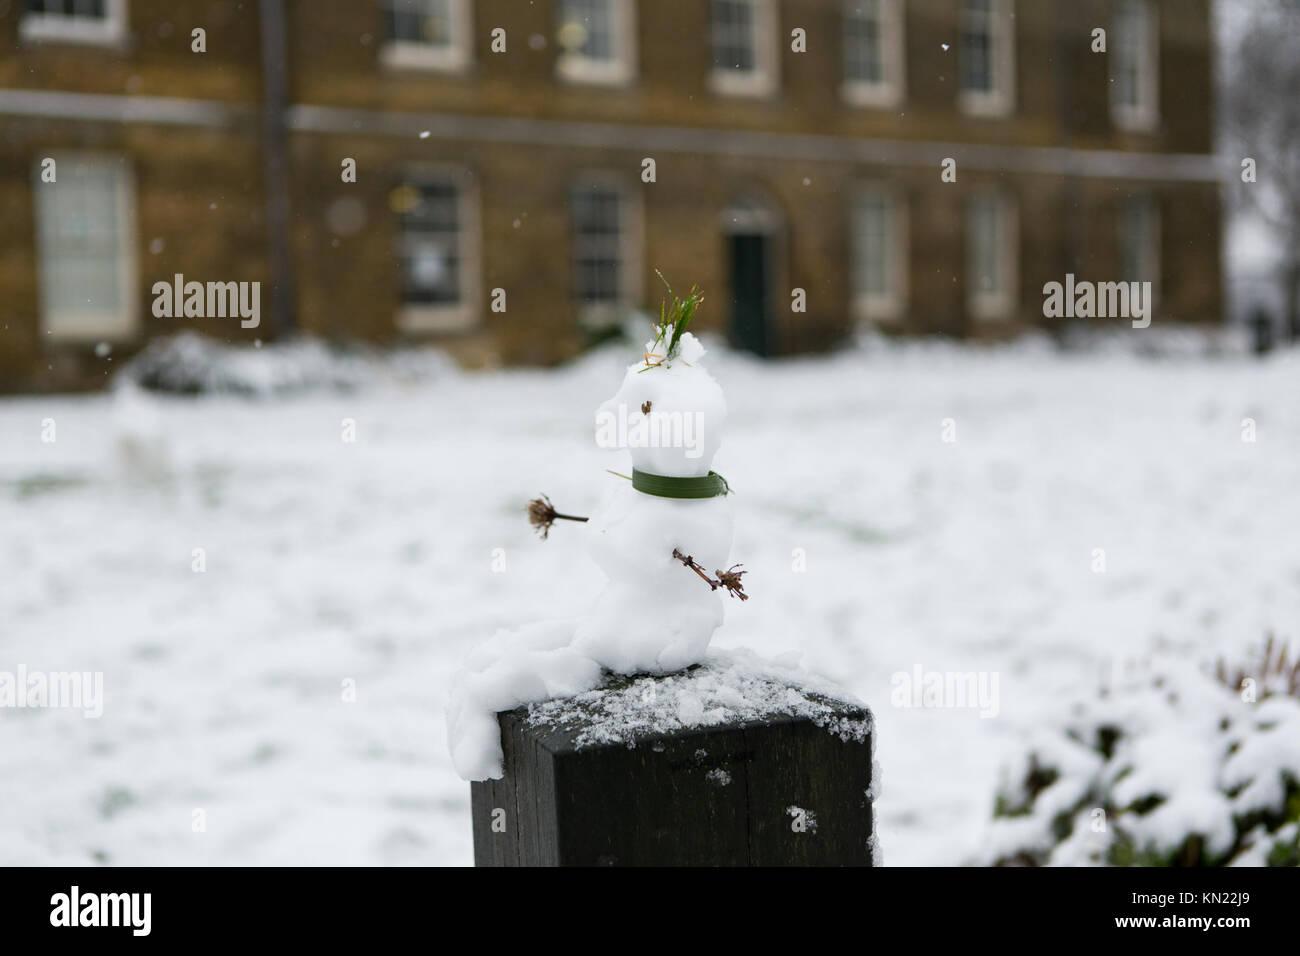 Stoke Newington, Hackney, London, UK. 10. Dezember, 2017. Schnee fällt in Stoke Newington, London. Schneemann, Stockbild